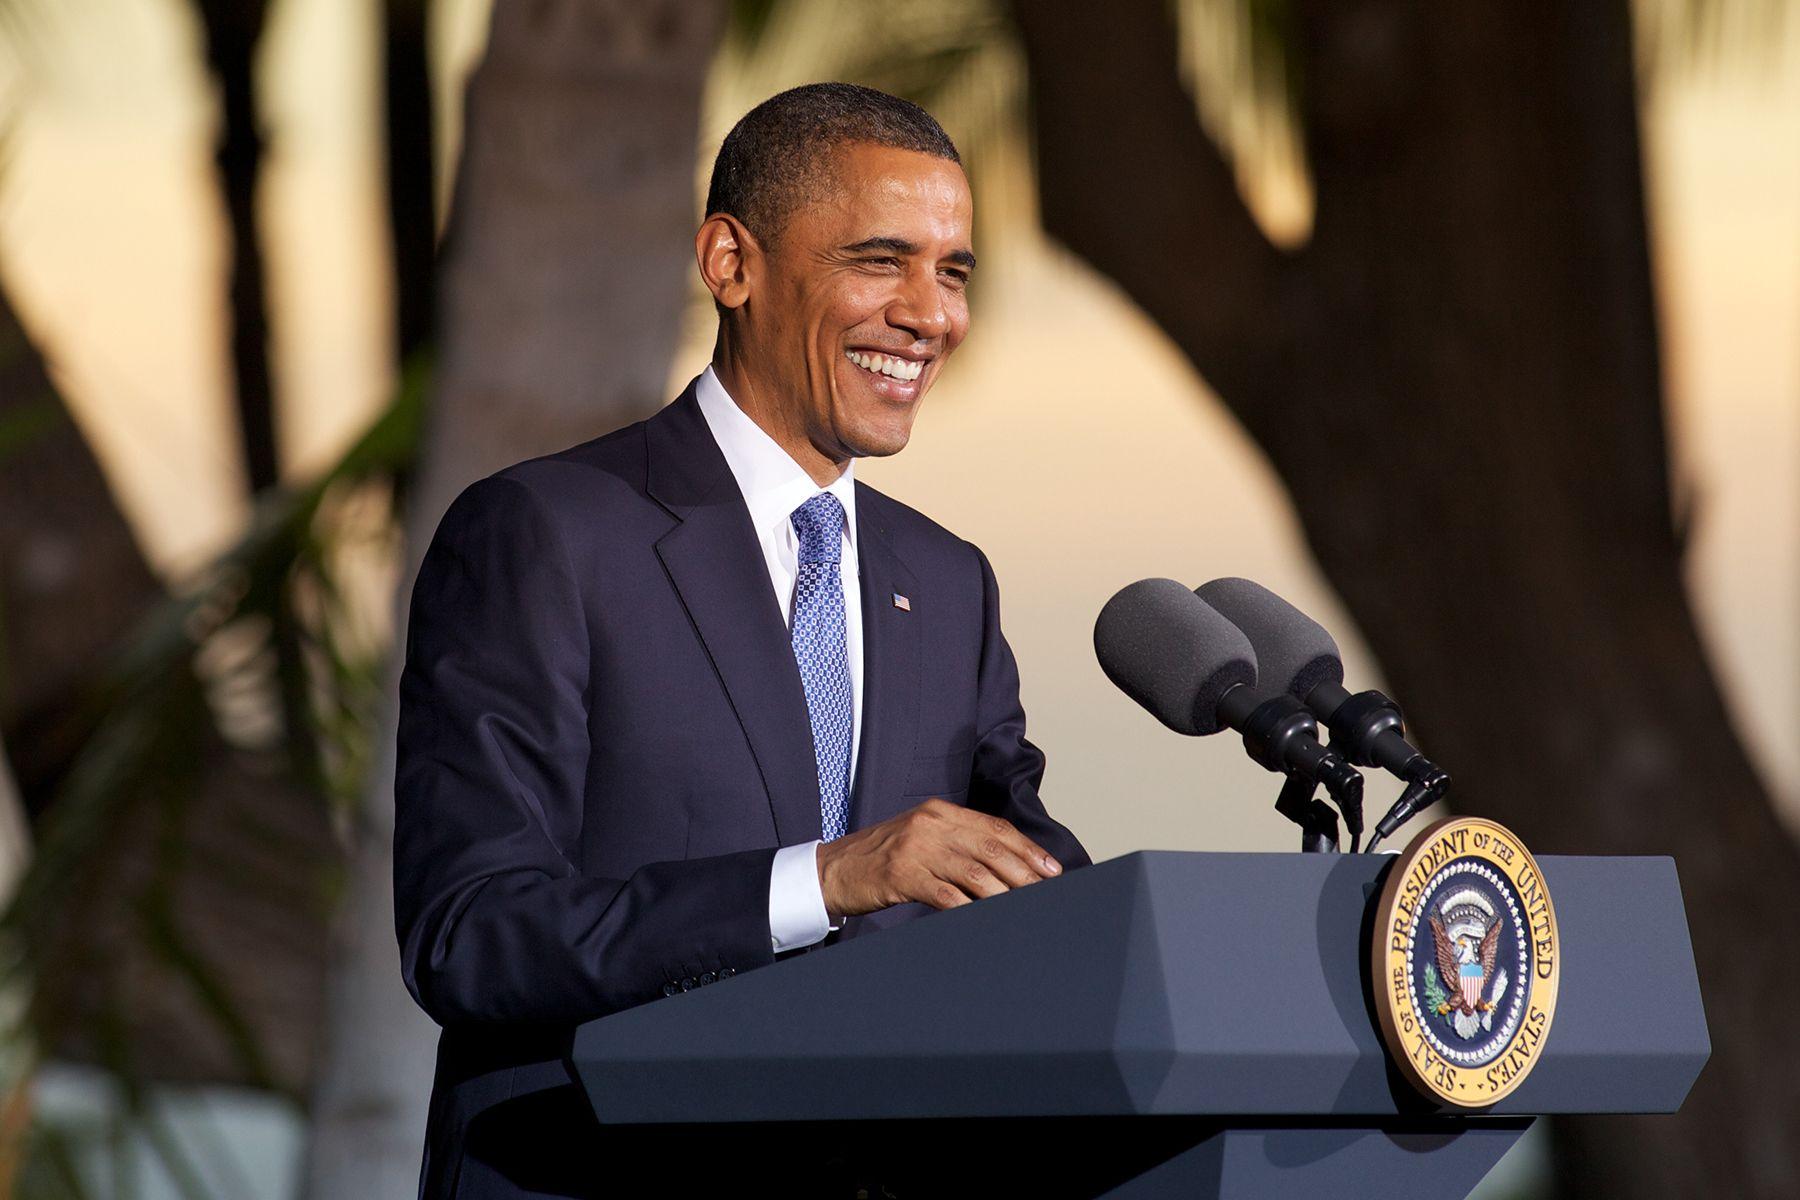 1_0_228_1r13_apec_president_obama_press_conference_027.jpg